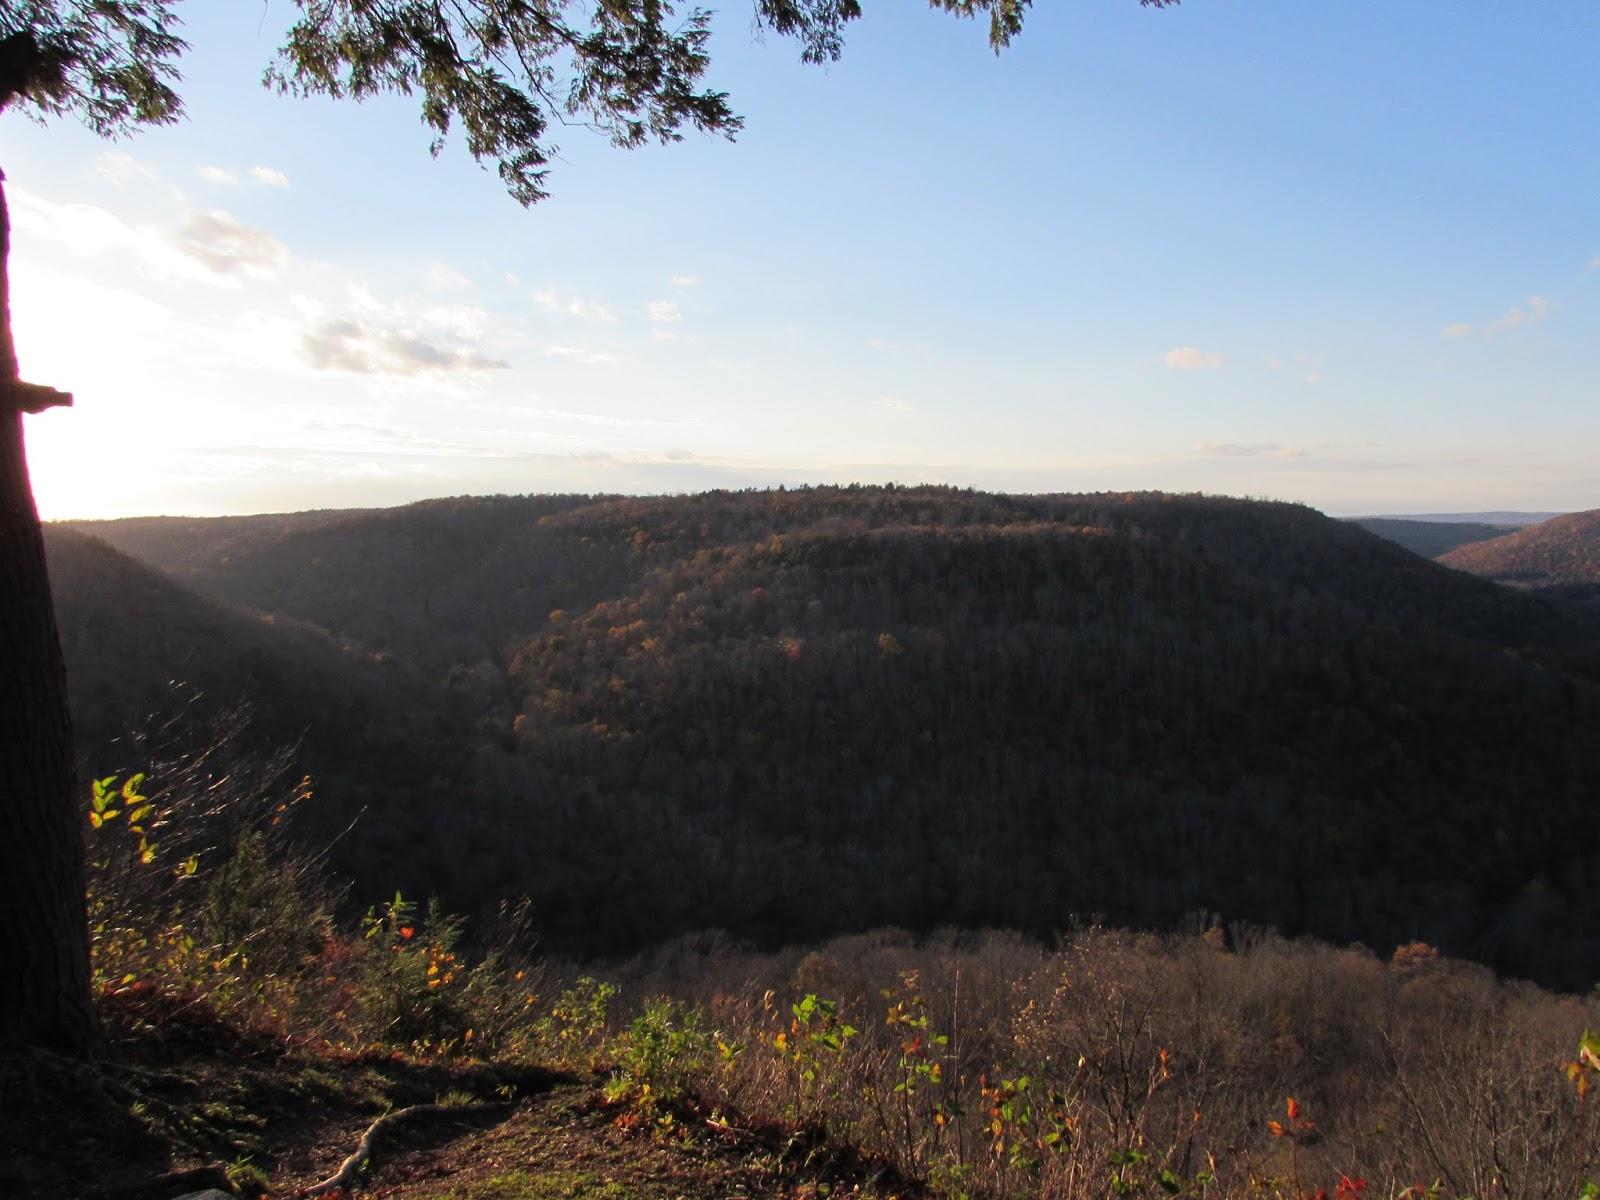 Loyalsock Canyon Vista, Worlds End State Park, Sullivan County, PA